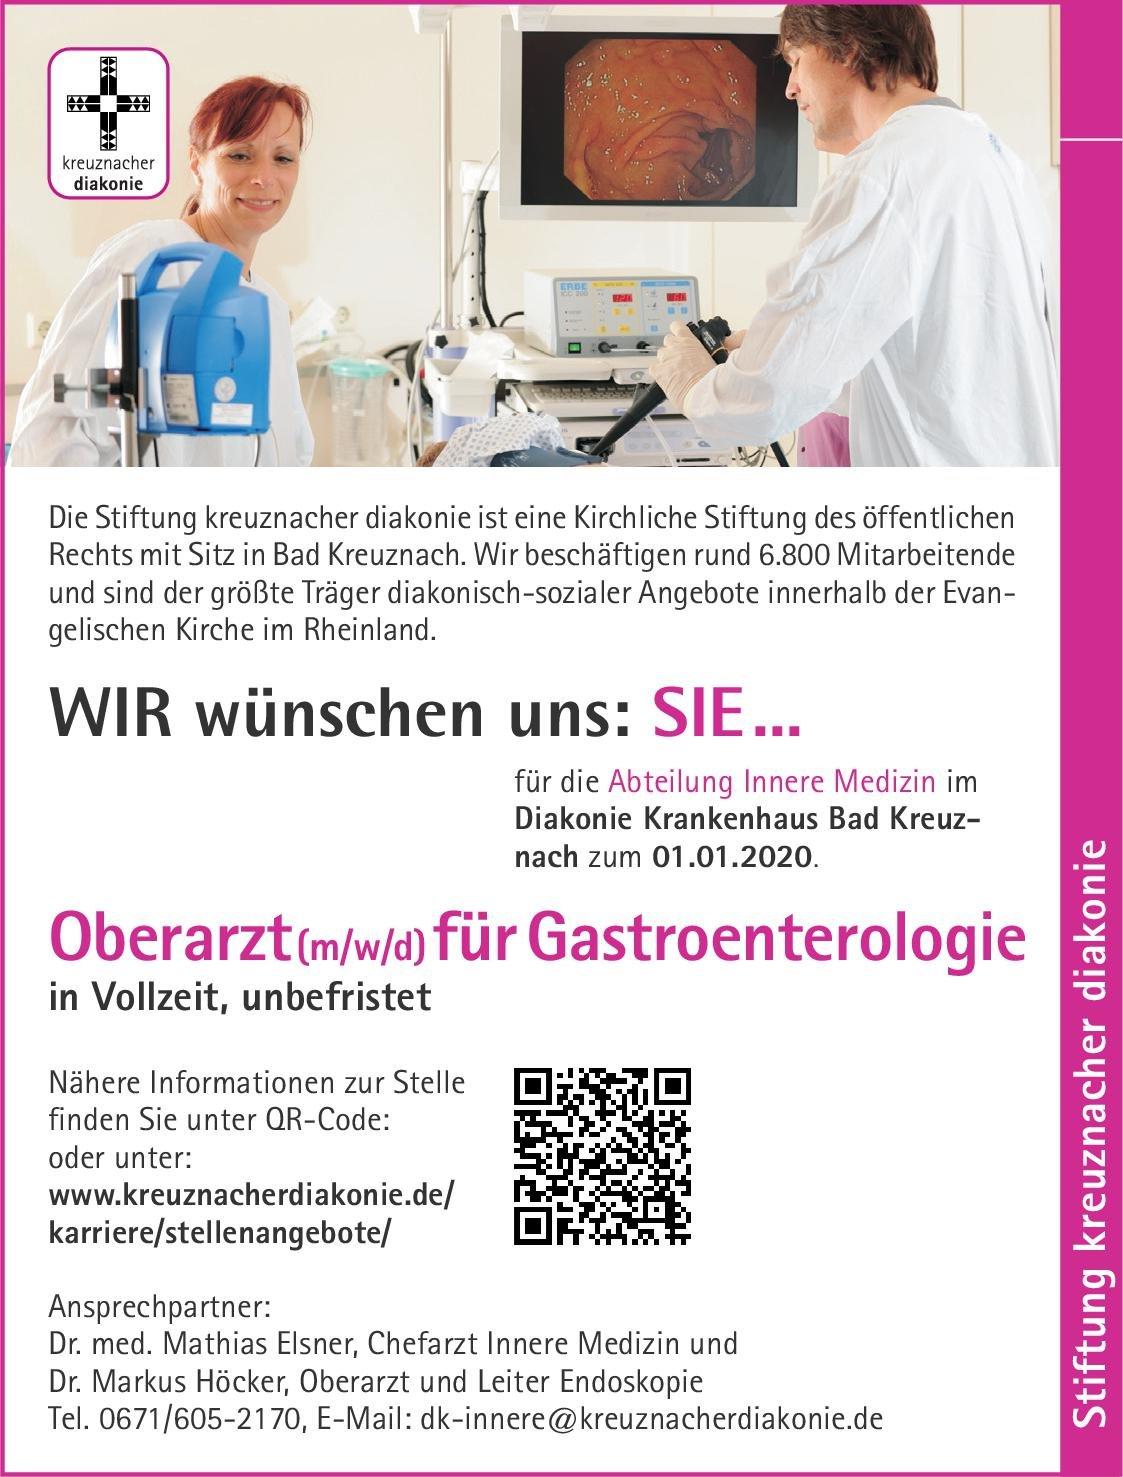 Stiftung kreuznacher diakonie - Diakonie Krankenhaus Bad Kreuznach Oberarzt (m/w/d) für Gastroenterologie  Innere Medizin und Gastroenterologie, Innere Medizin Oberarzt